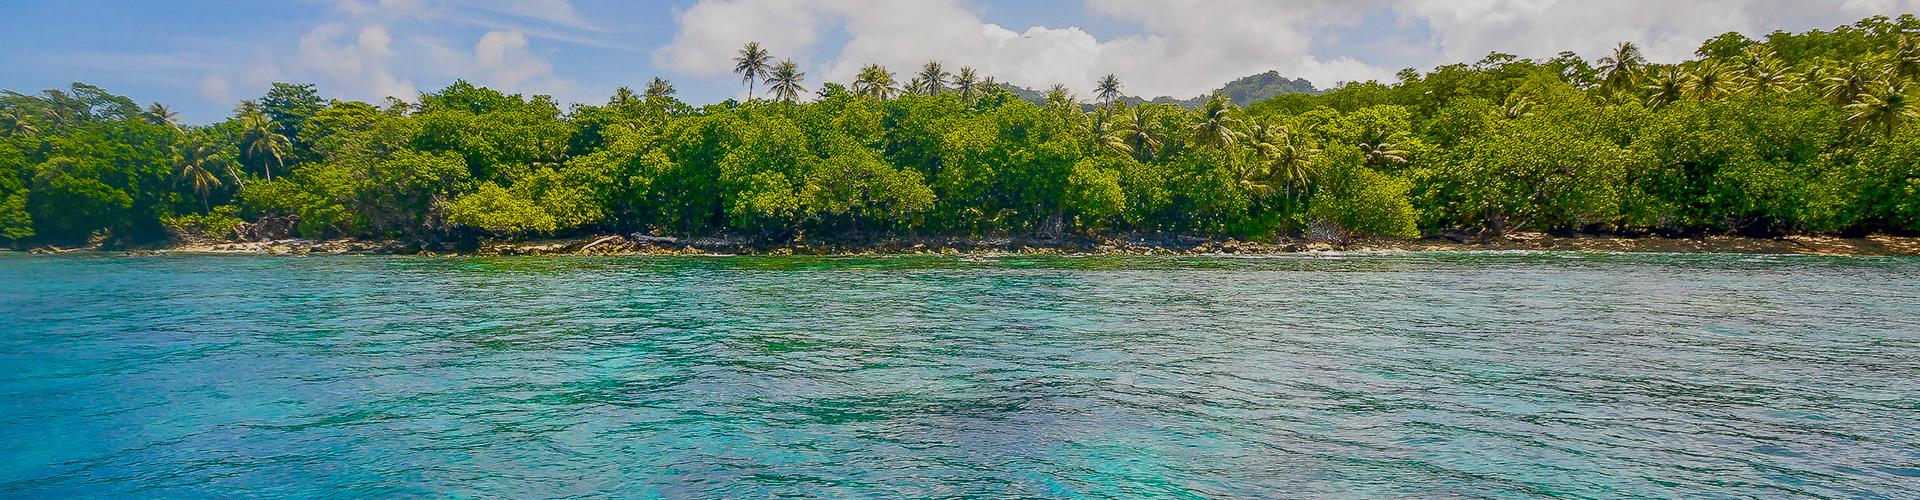 Landmark photograph of Micronesia